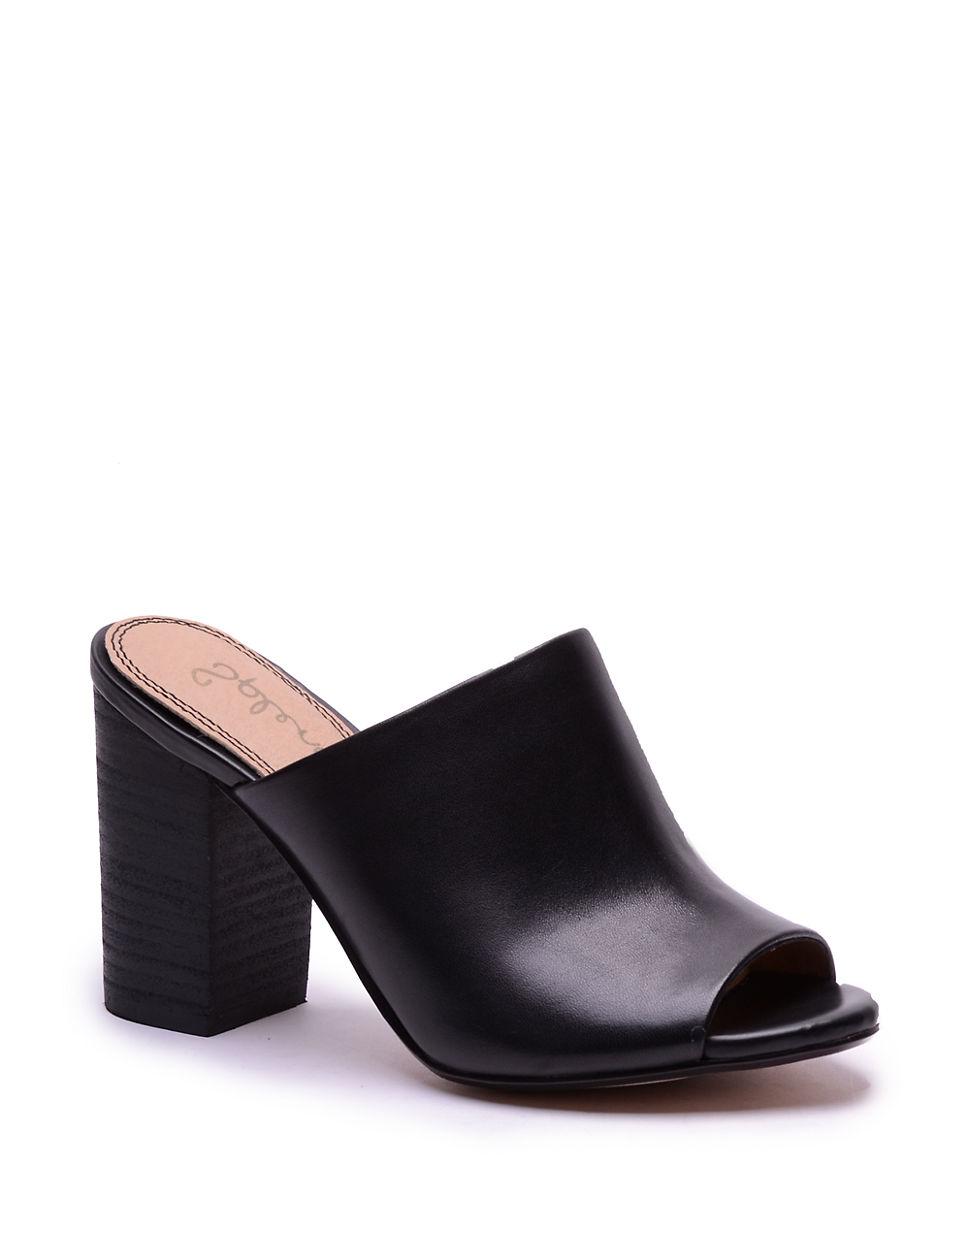 1cb585801db Splendid Black Leather Mules